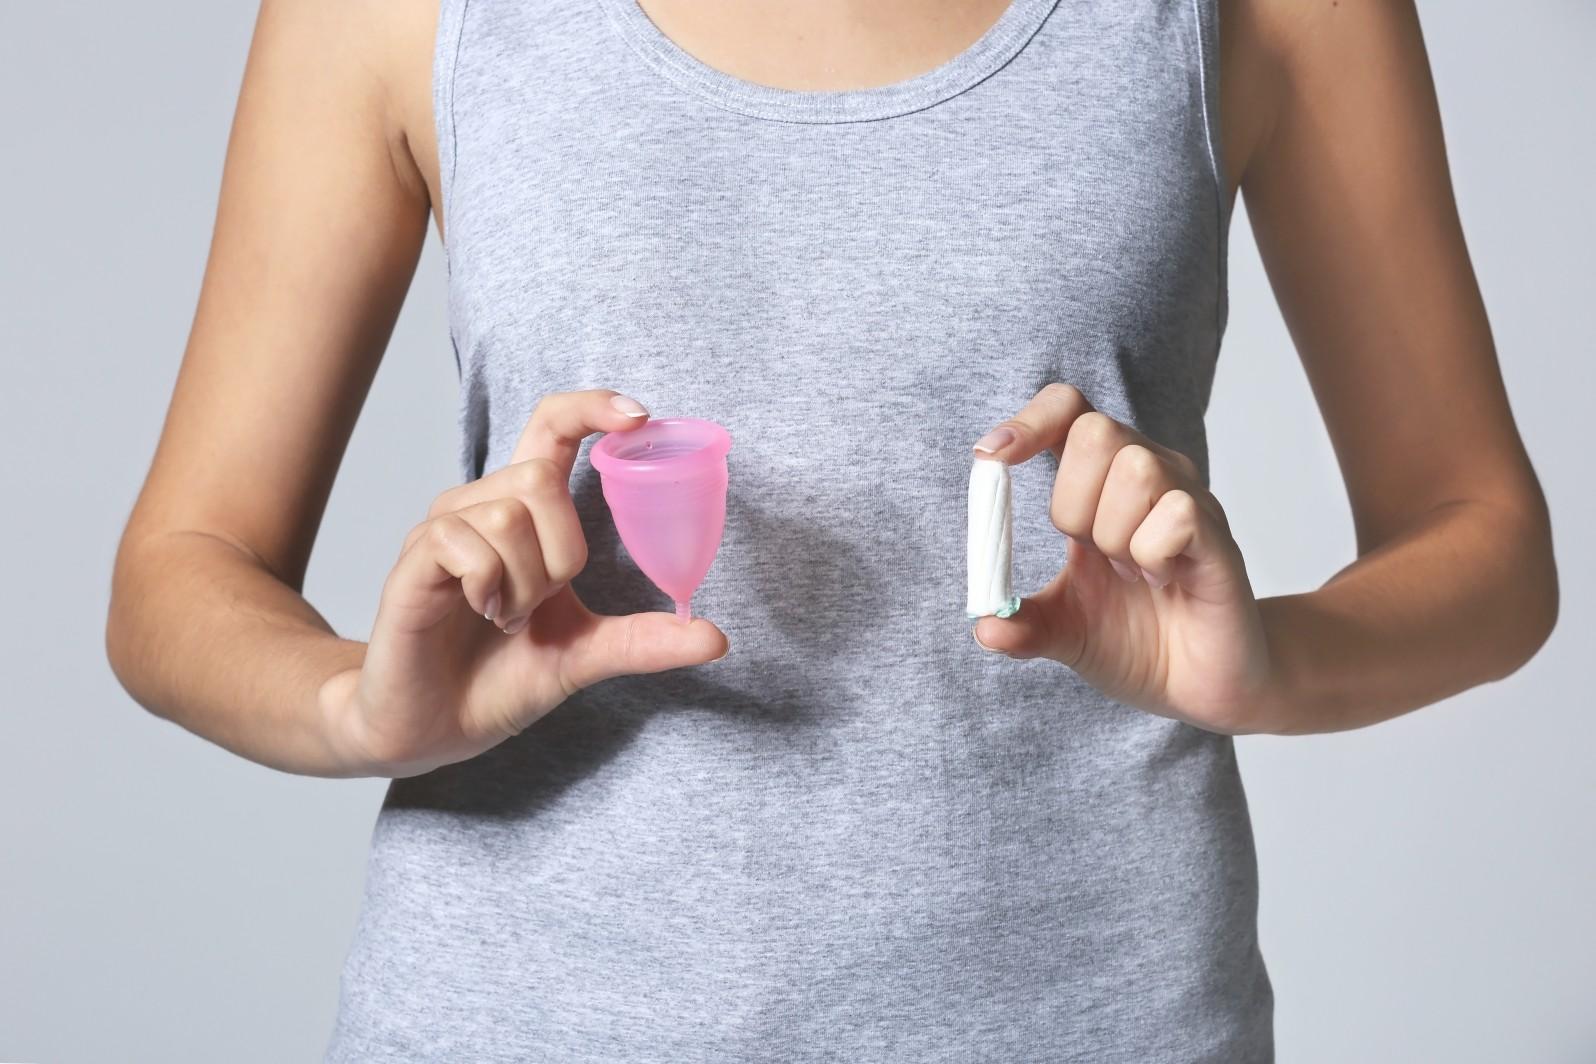 Colocación copa menstrual. Ginecología, DIU. Mediquo, Tu amigo médico. Chat médico.